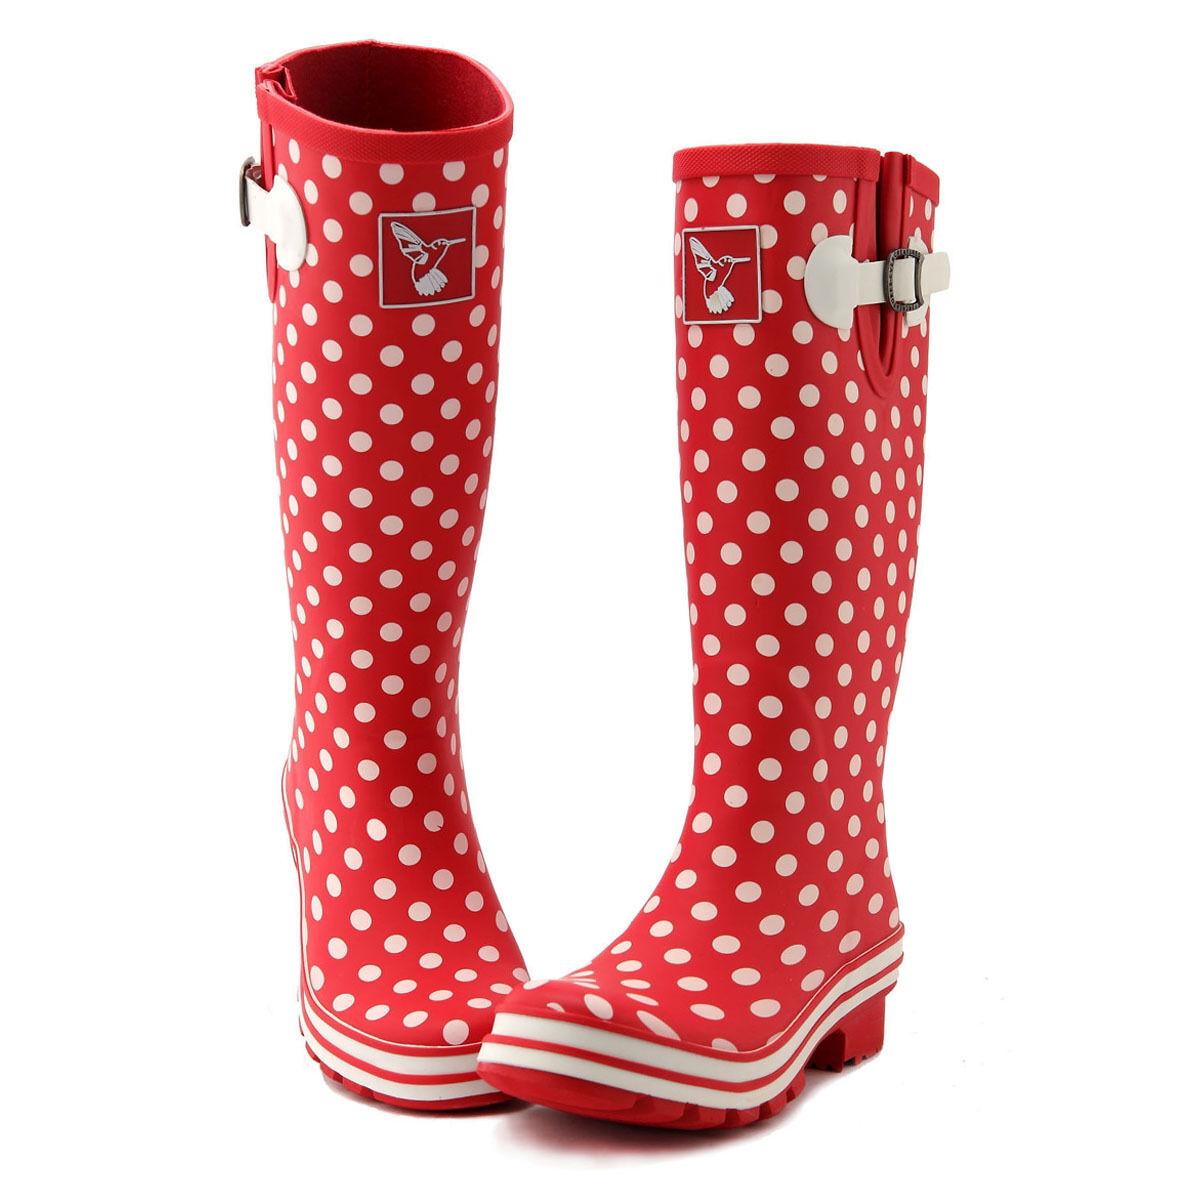 Evercreatures UK Brand Fashion Women's Red Rubber Rain Boots Poka Dots Printing